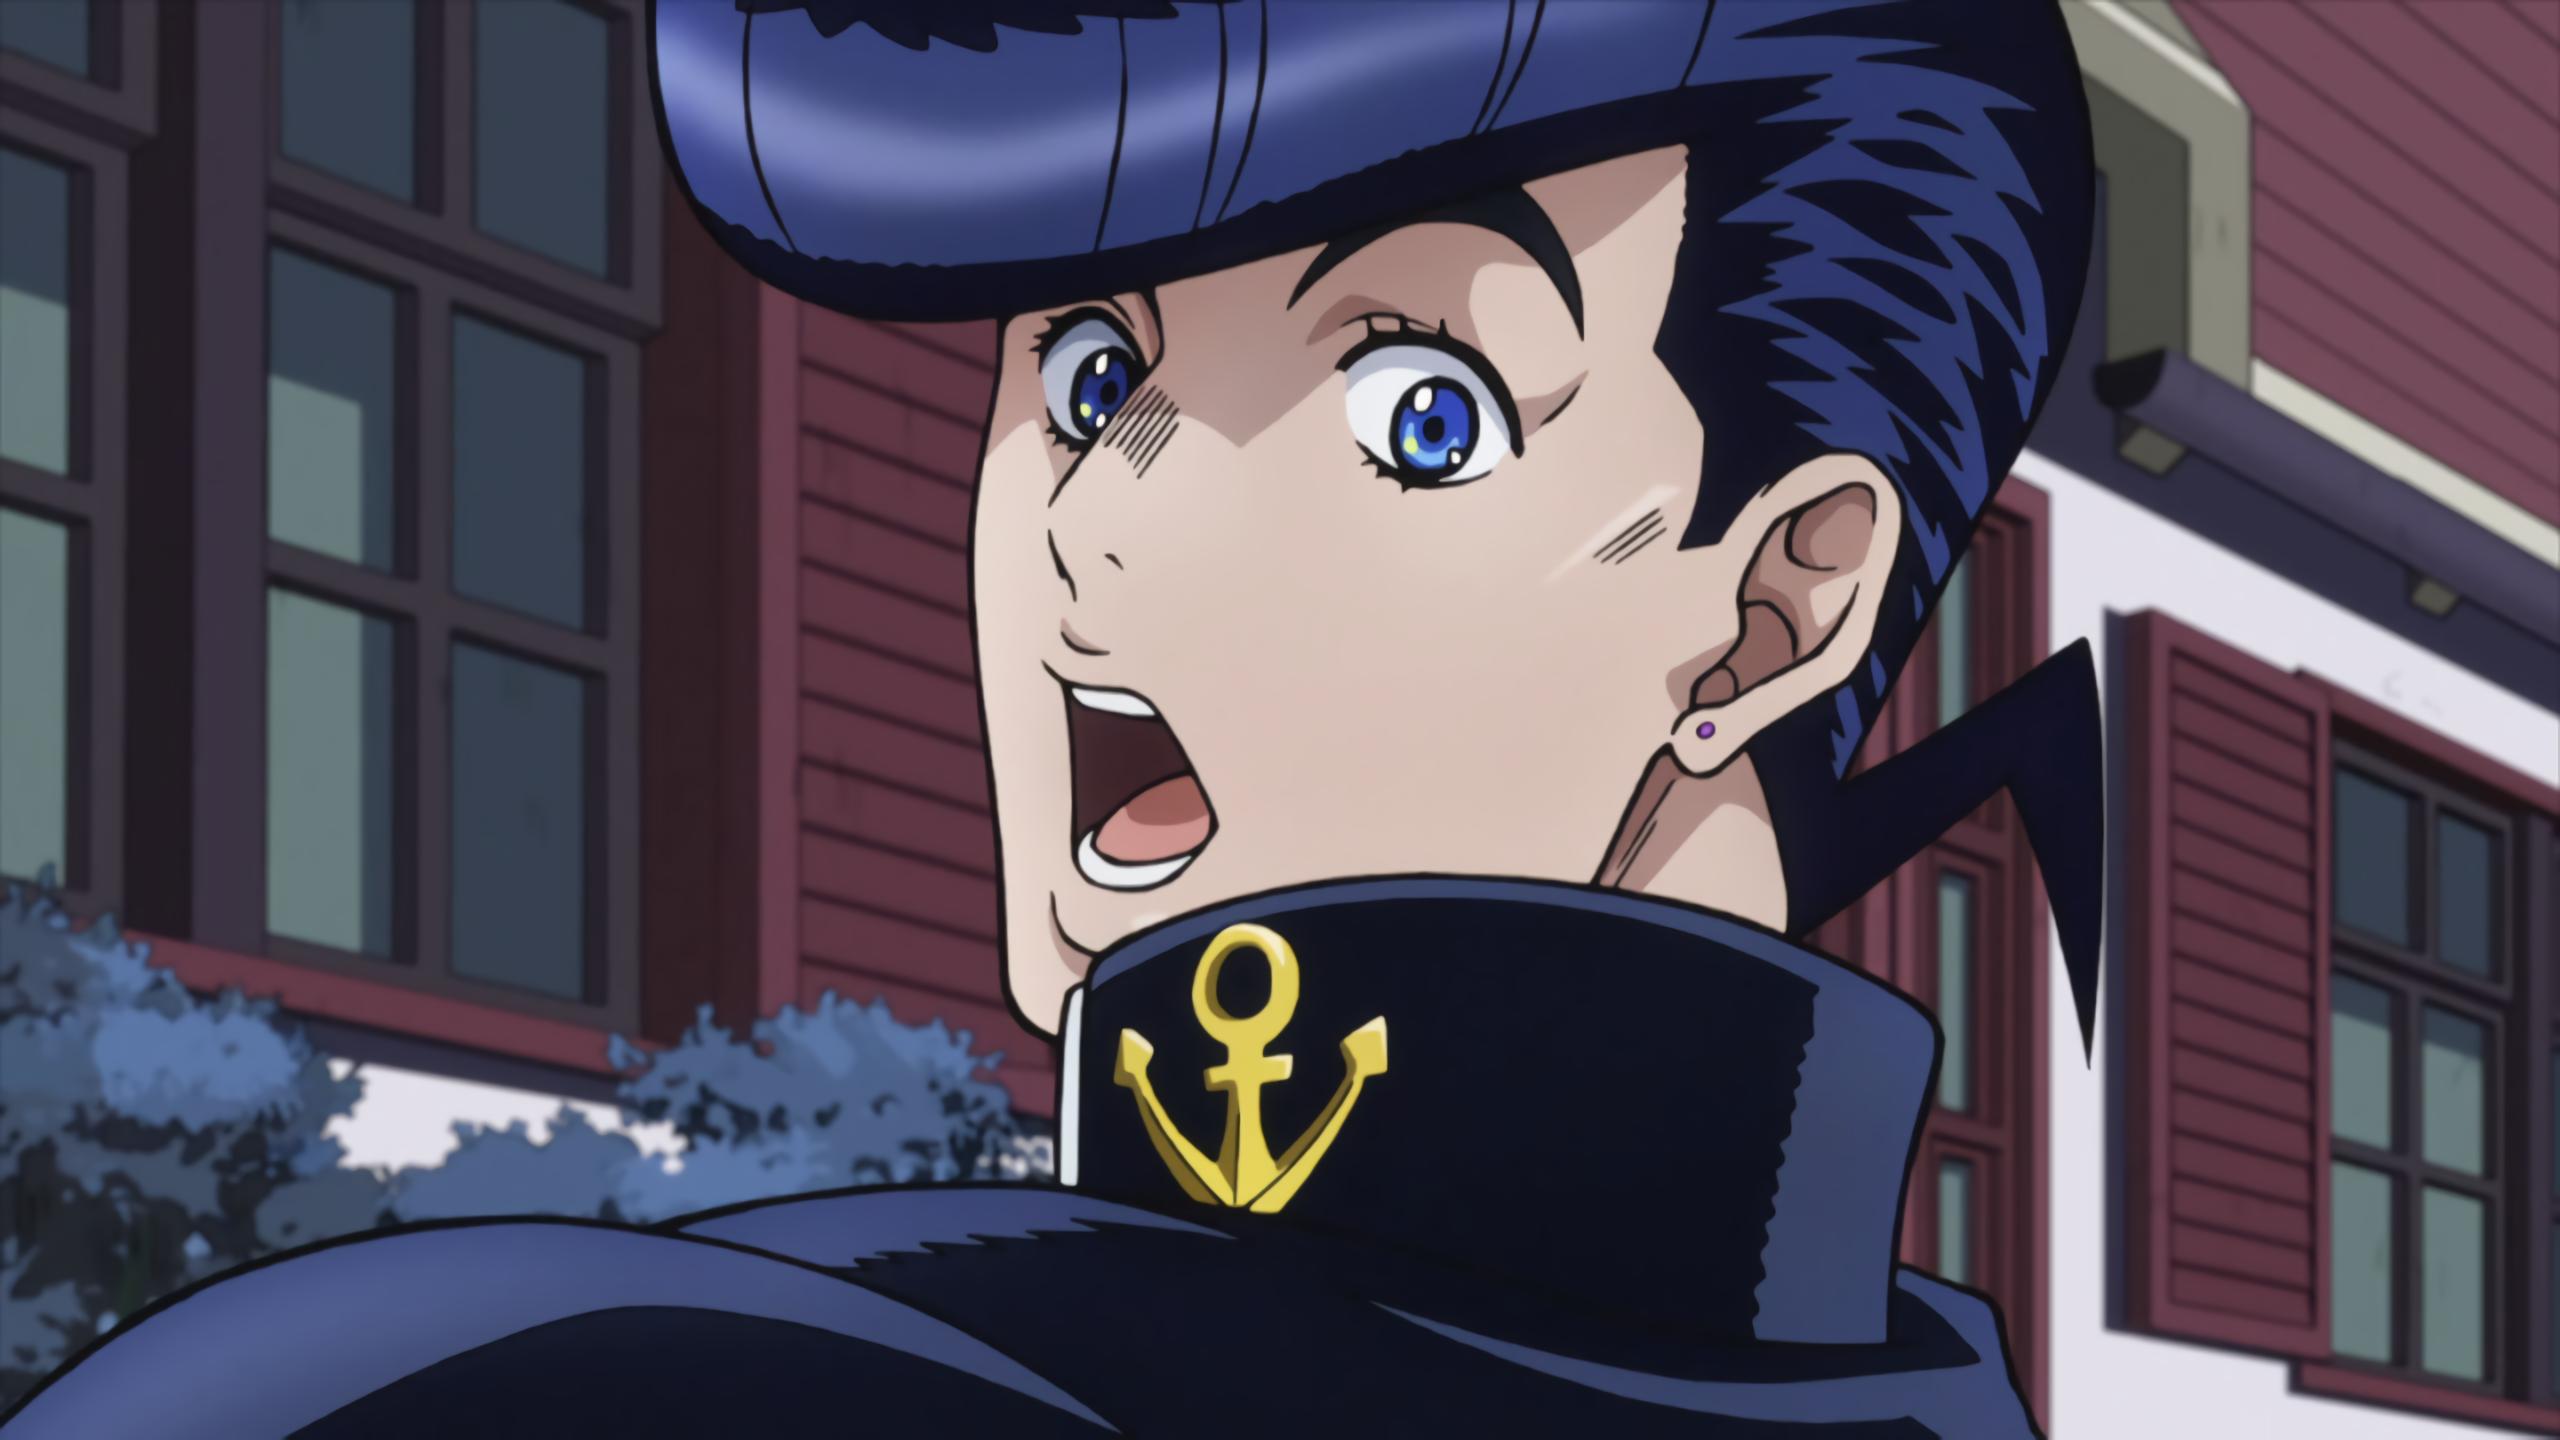 Jojo S Bizarre Adventure Anime Josuke Higashikata Jojo Bizarre Jojo Bizzare Adventure Jojo S Bizarre Adventure